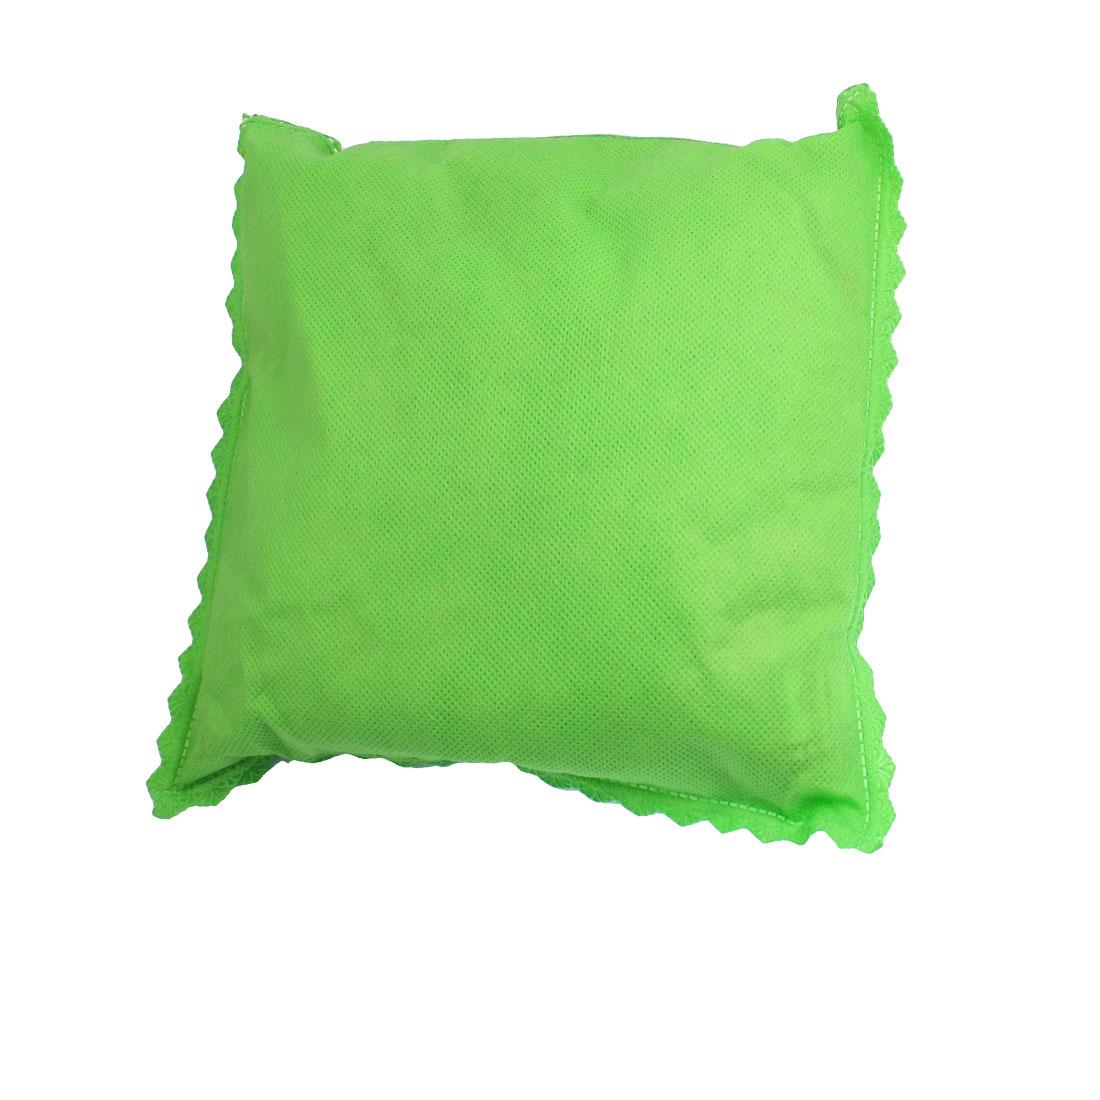 Green Car Interior Deodorant Air Freshener Bamboo Charcoal Bag